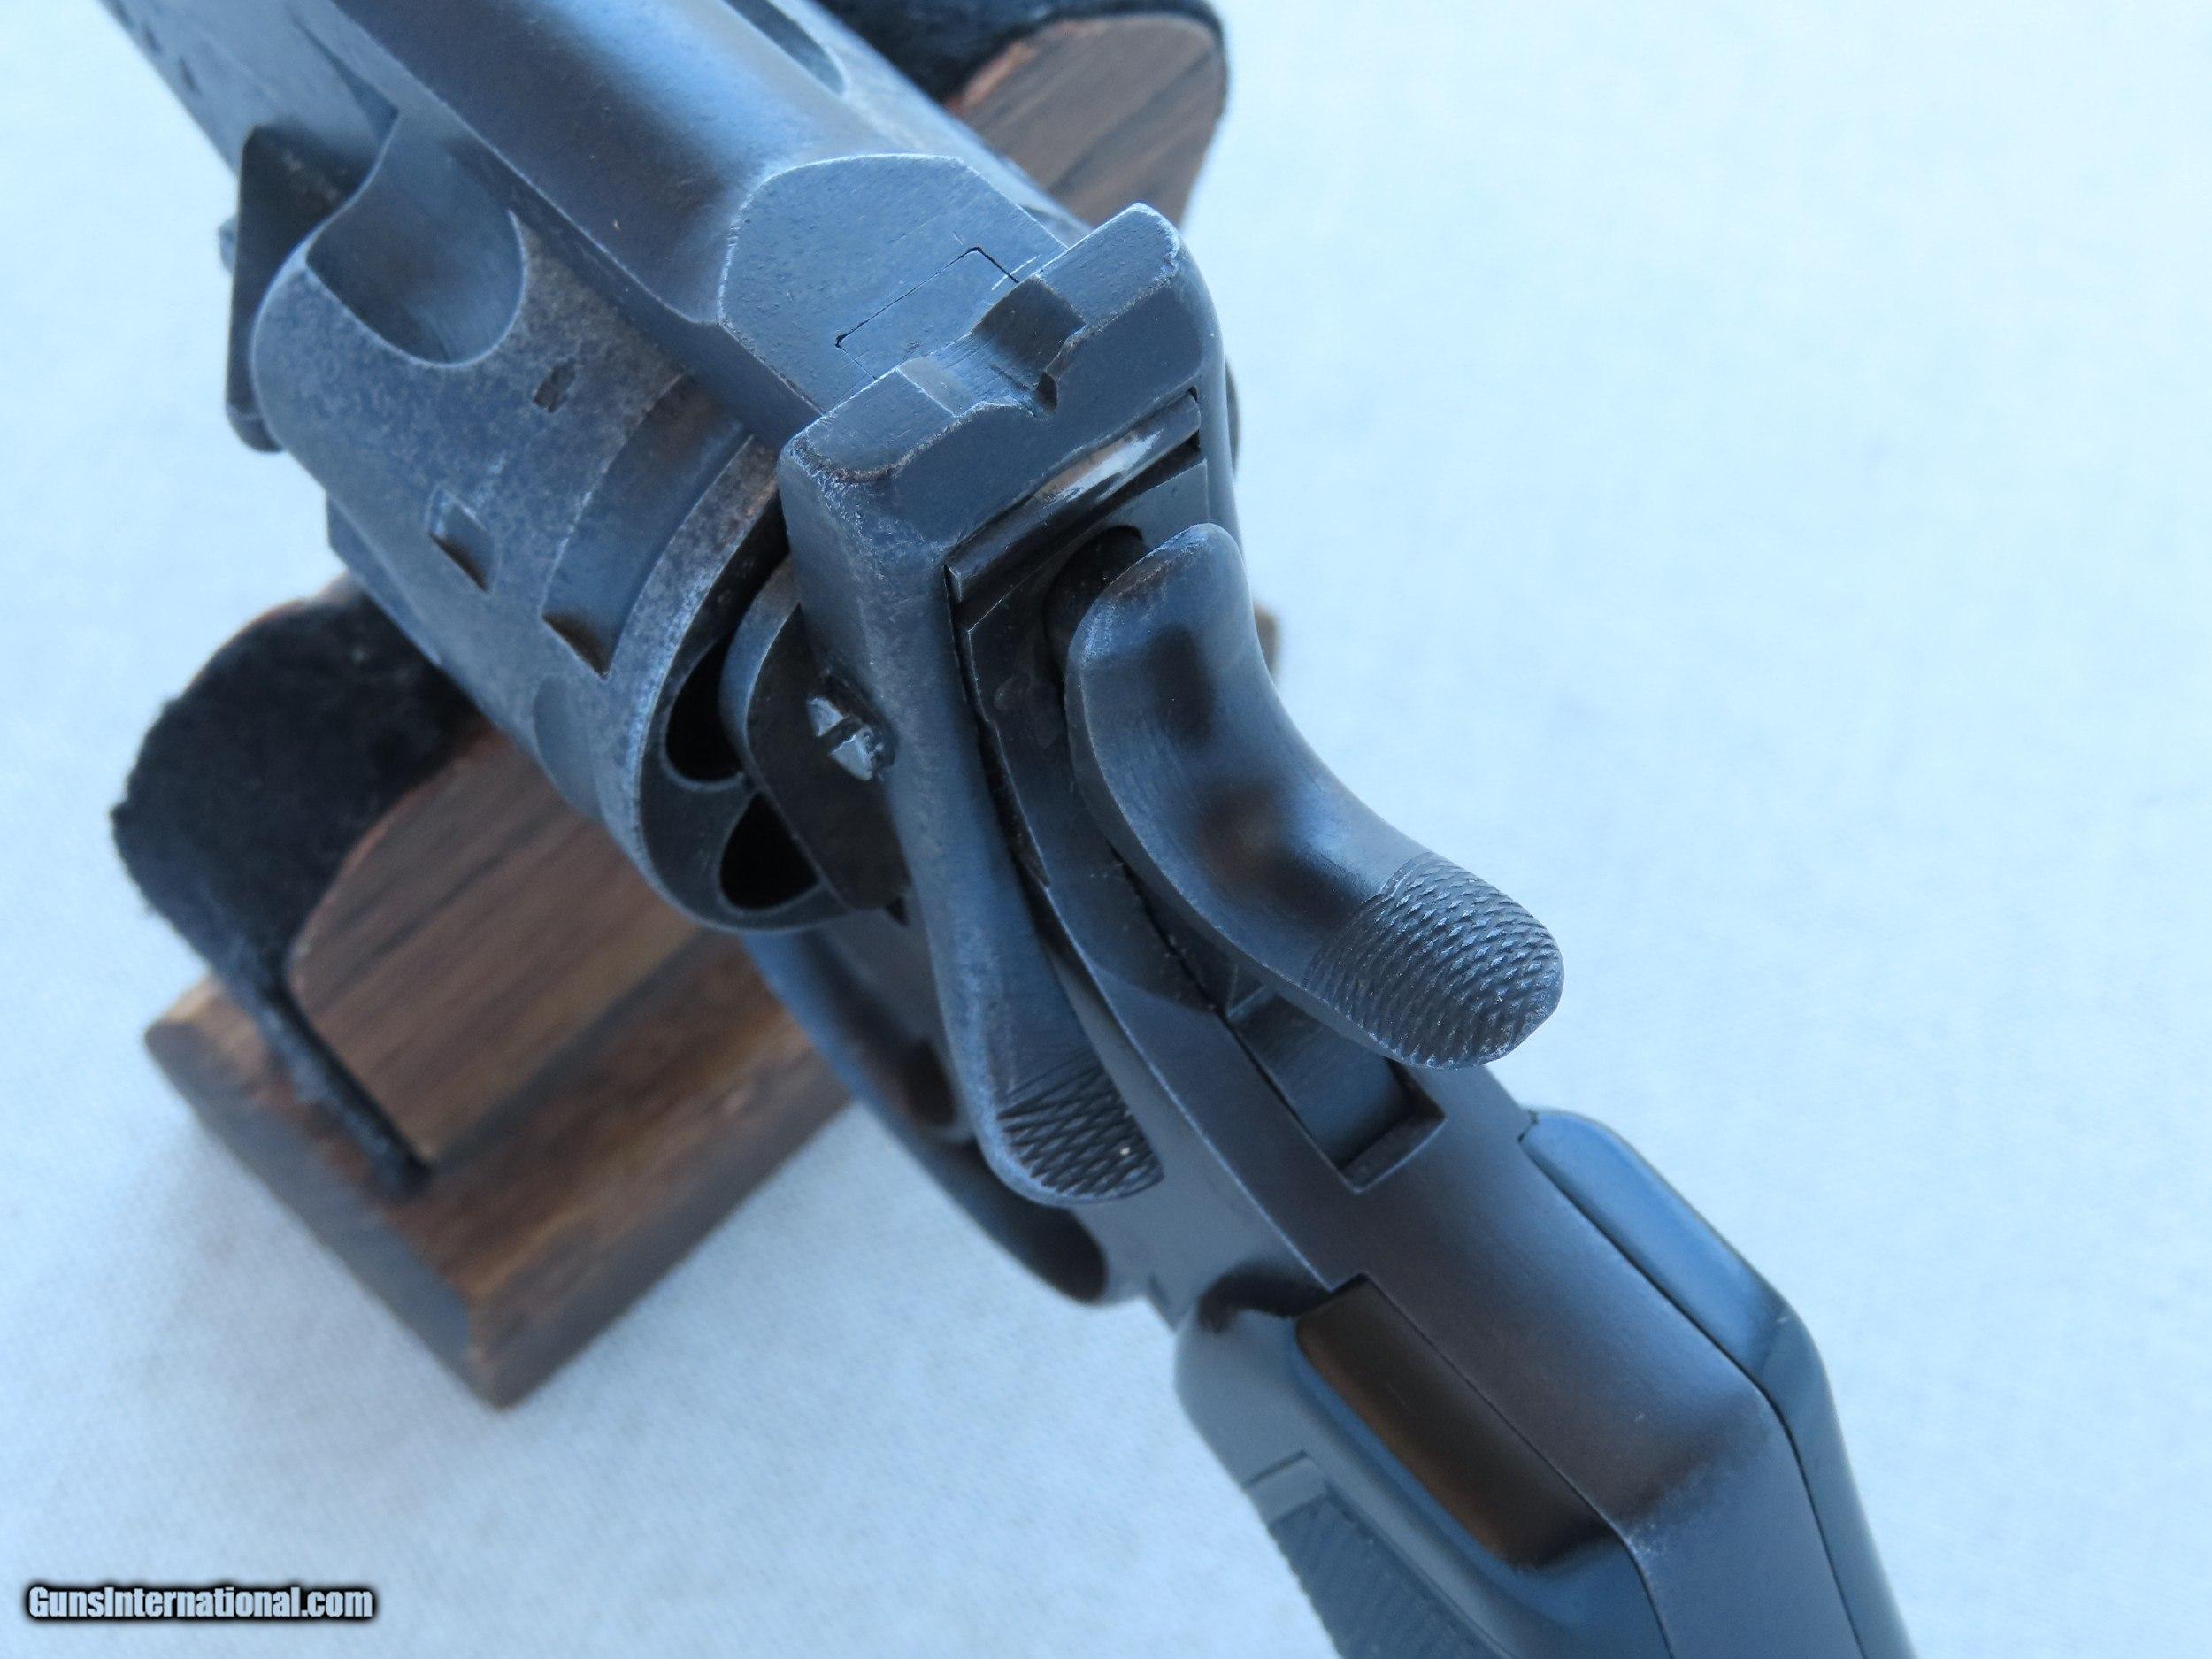 Circa 1919 British Military Webley Mark VI Service Revolver